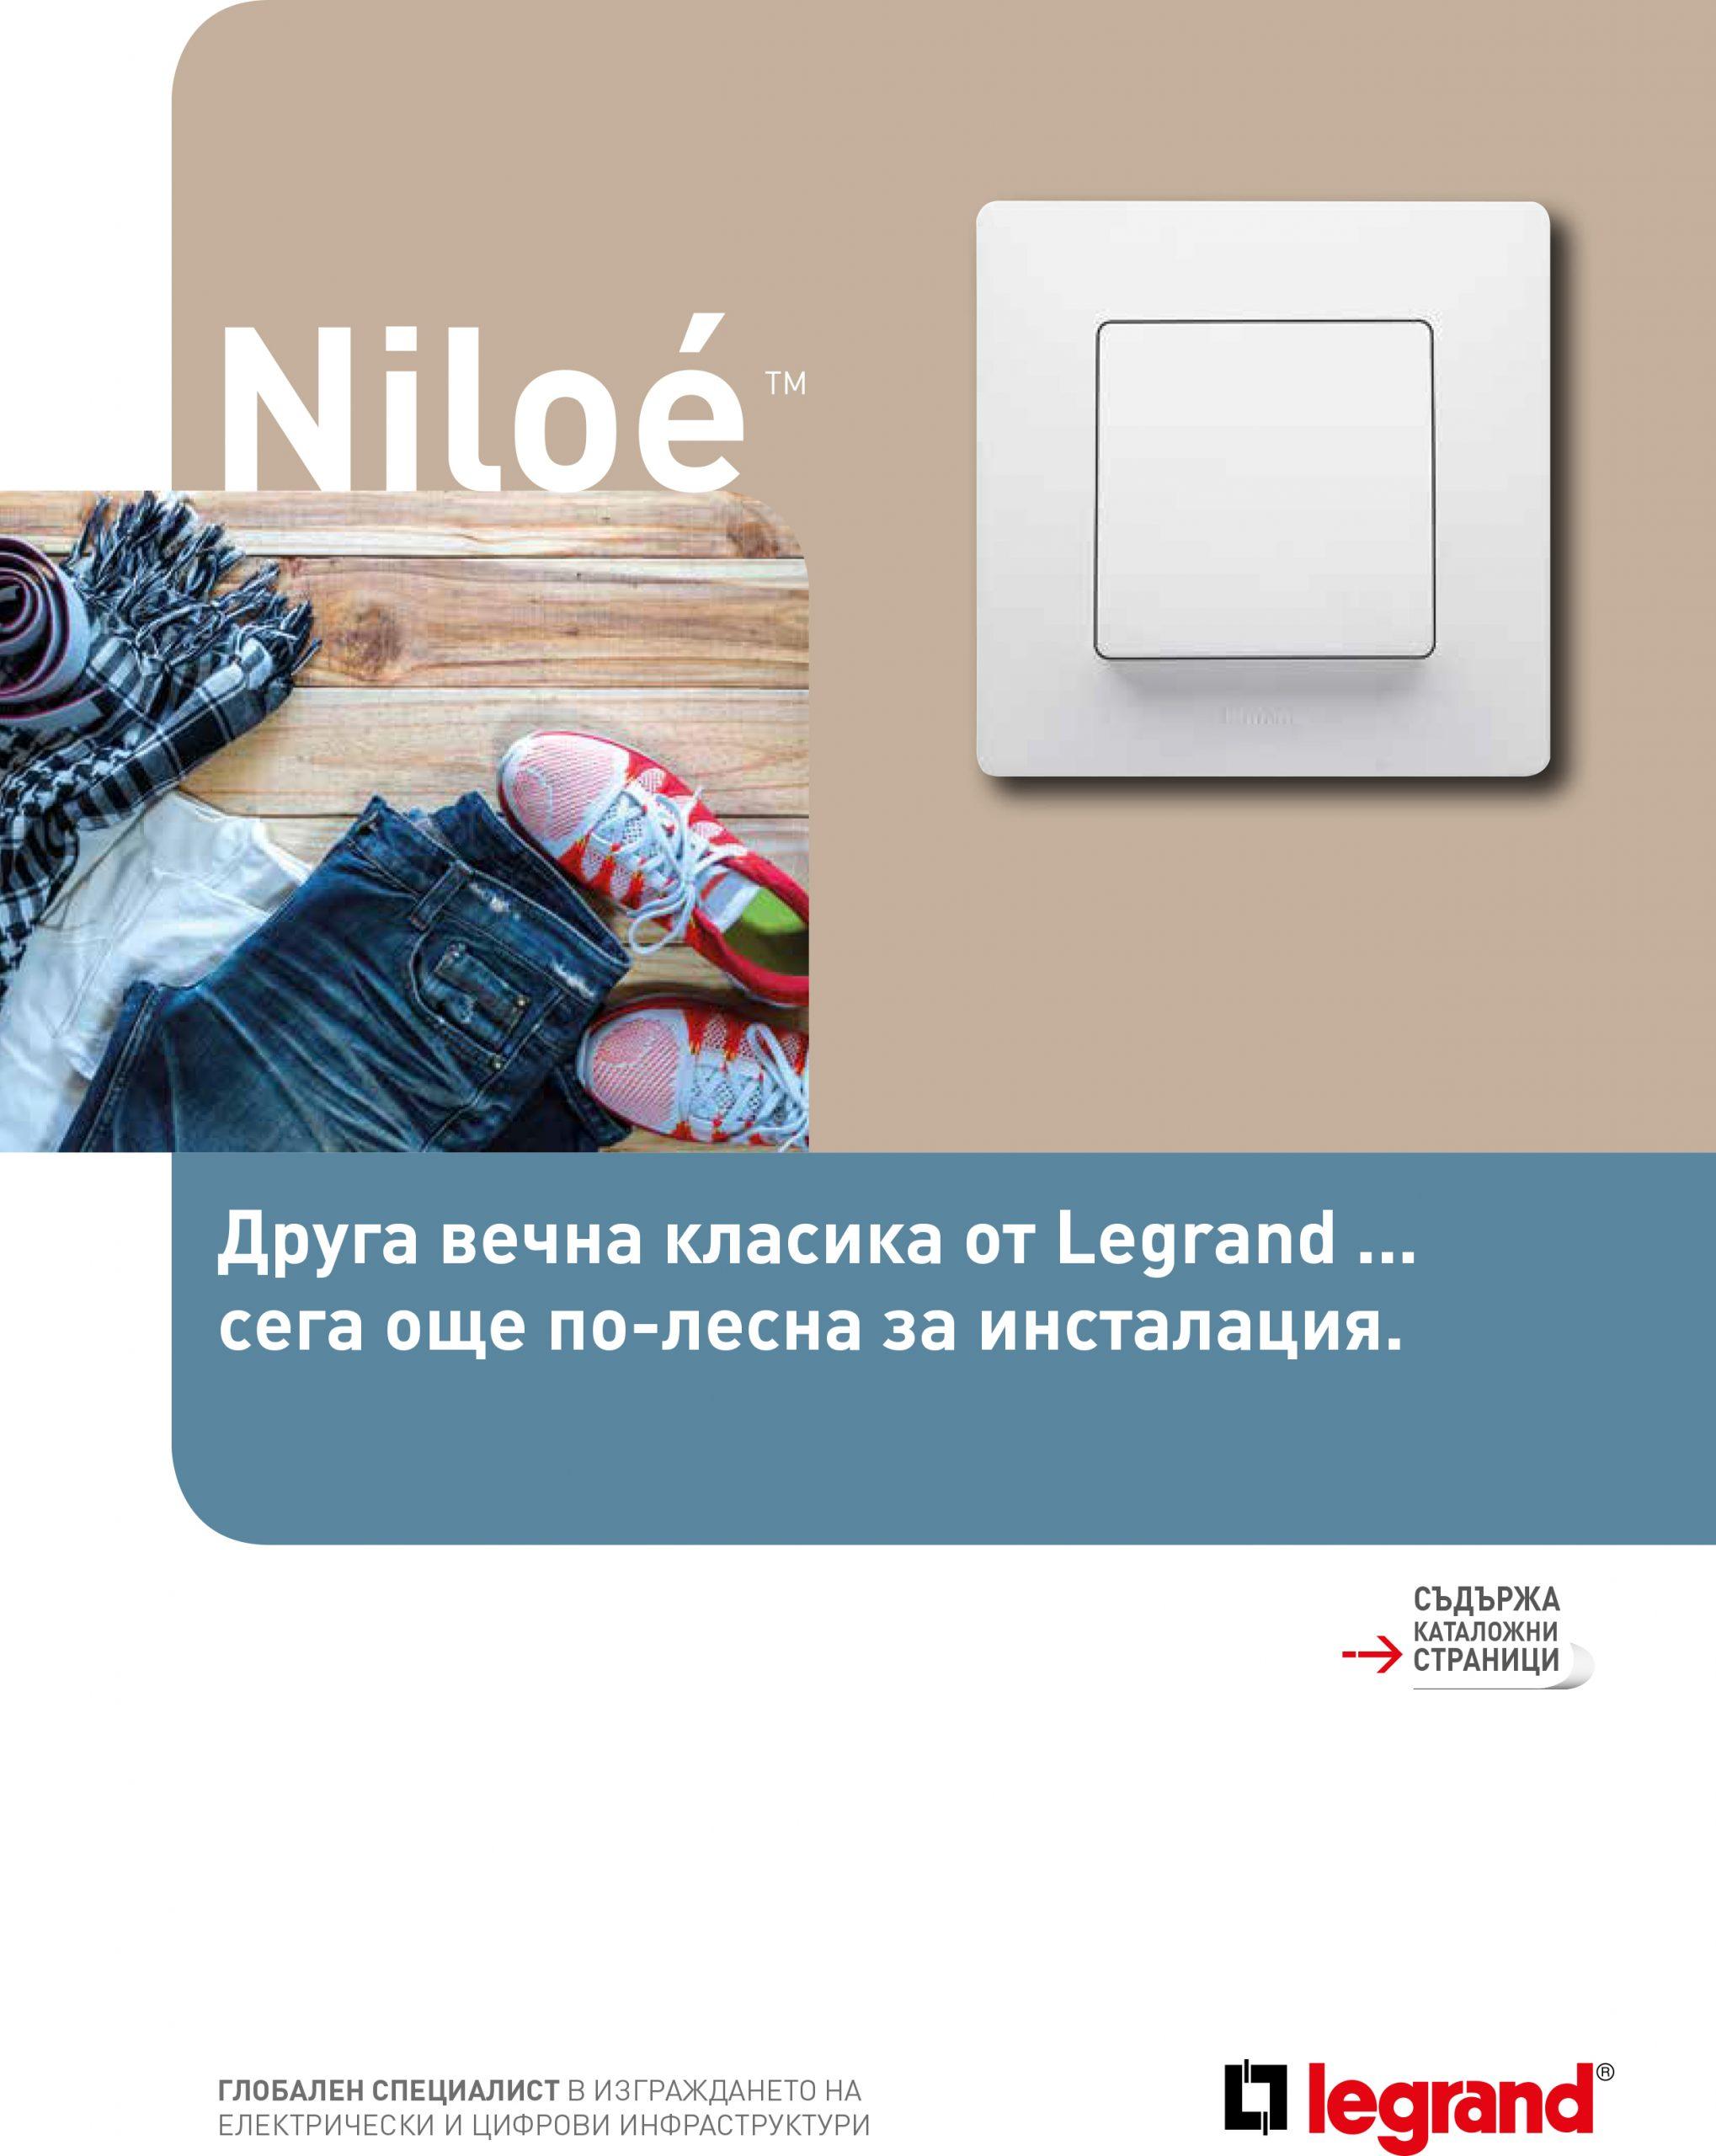 LEGRAND Niloe_2018_BG-1